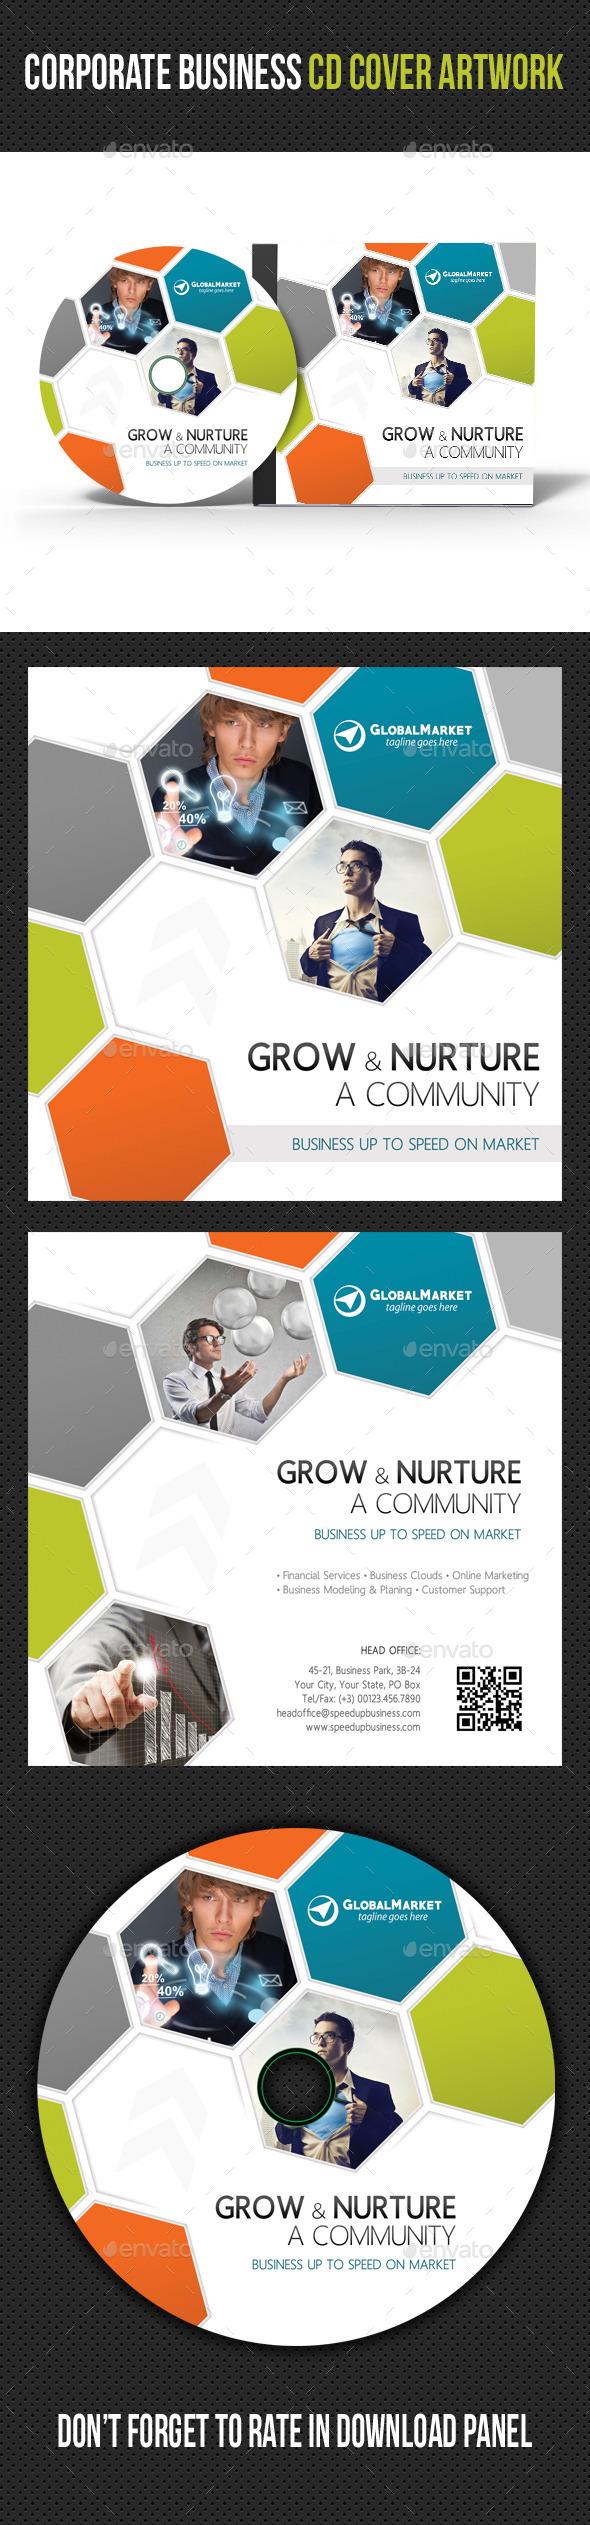 Corporate Business CD Cover Artwork V03 - CD & DVD Artwork Print Templates